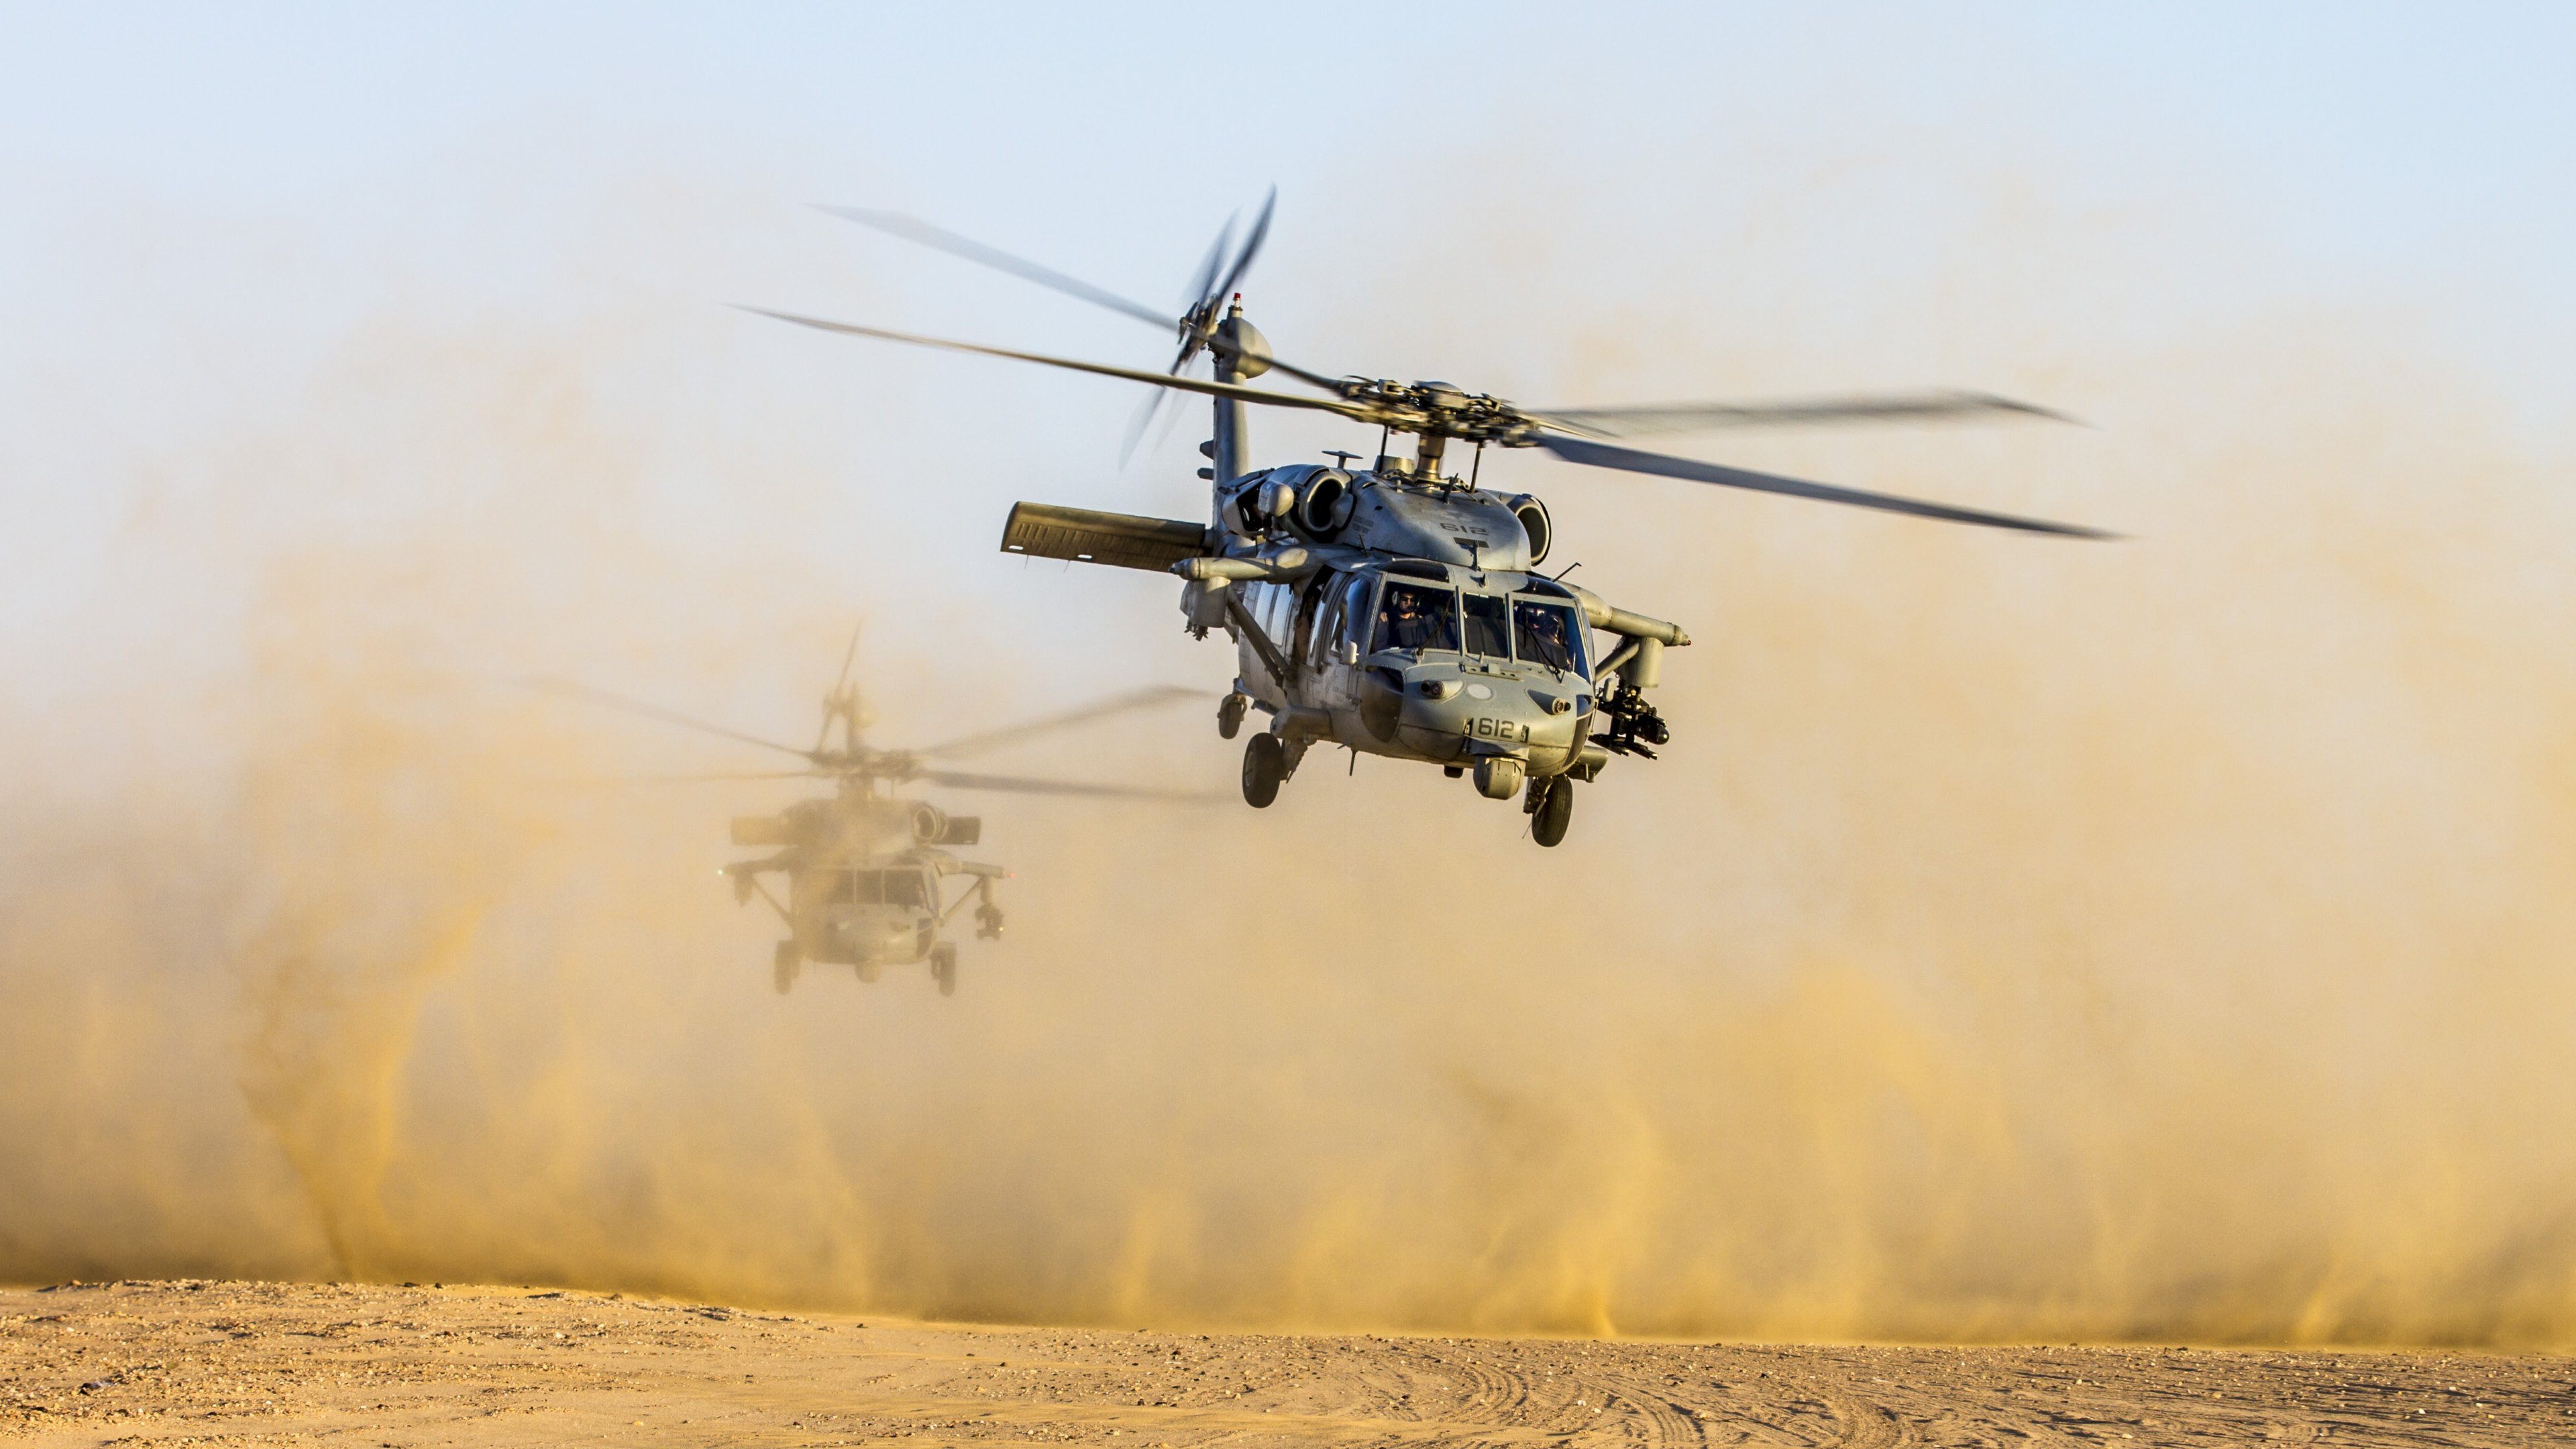 Military Helicopter Wallpaper HD 2822 3840x2160   uMadcom 3840x2160